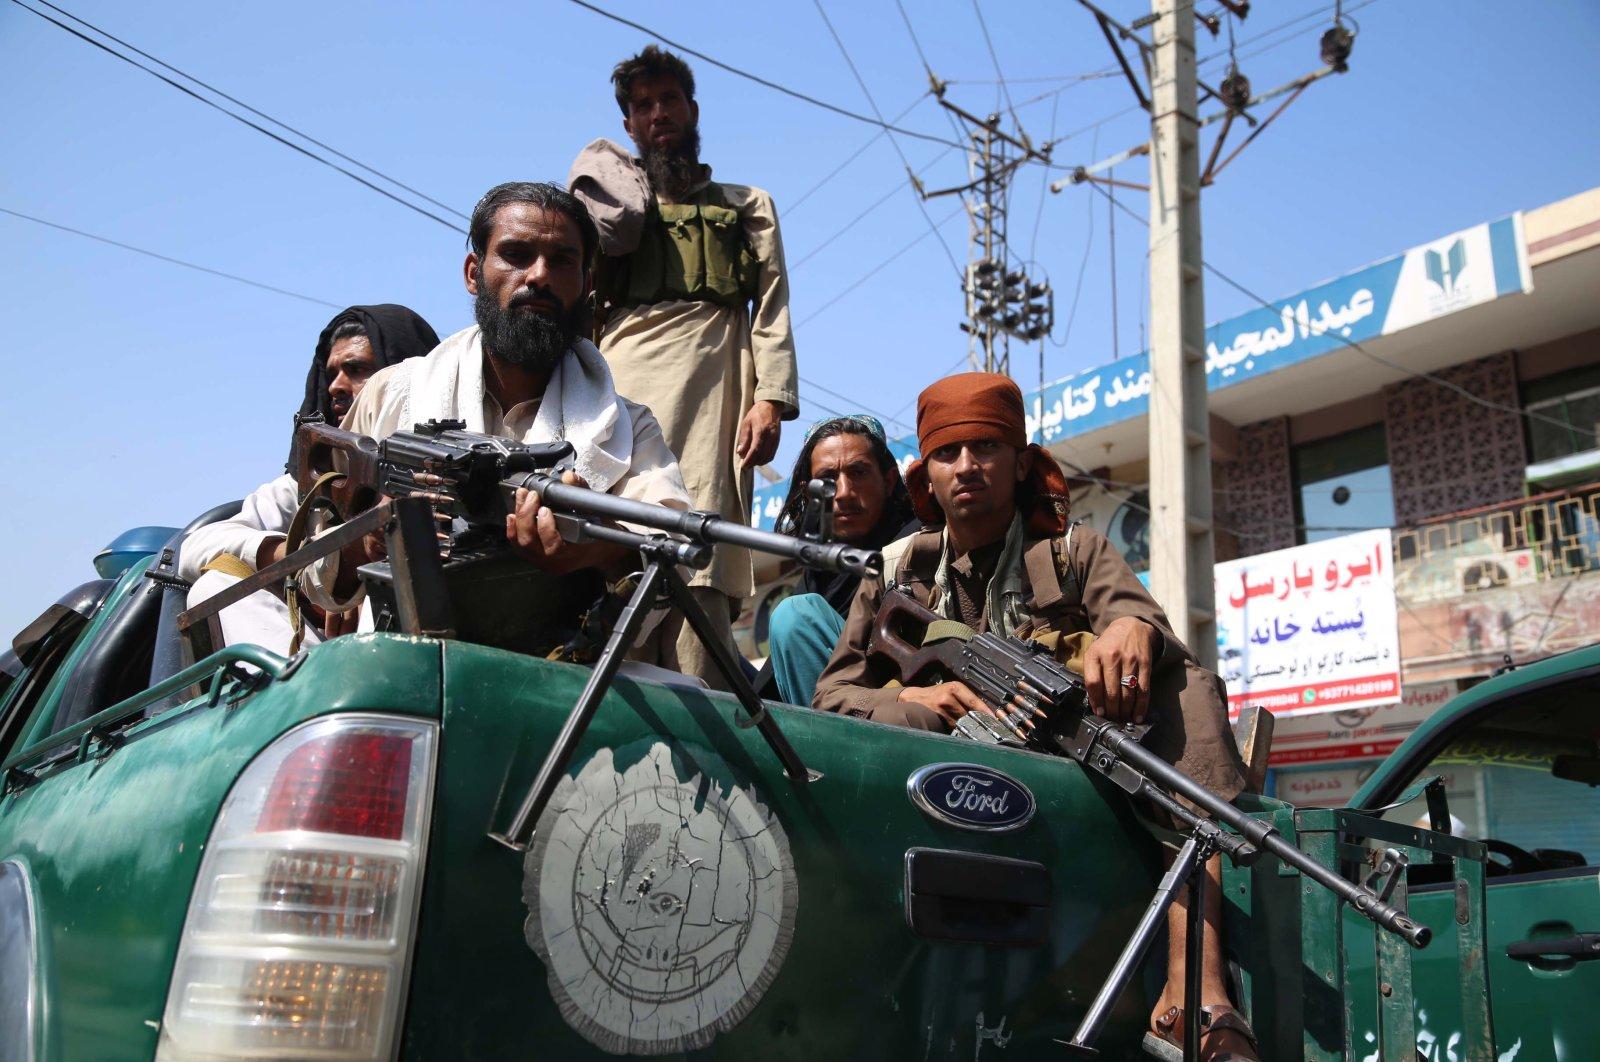 Taliban fighters patrol in Jalalabad, Afghanistan, Aug. 17, 2021. (EPA Photo)